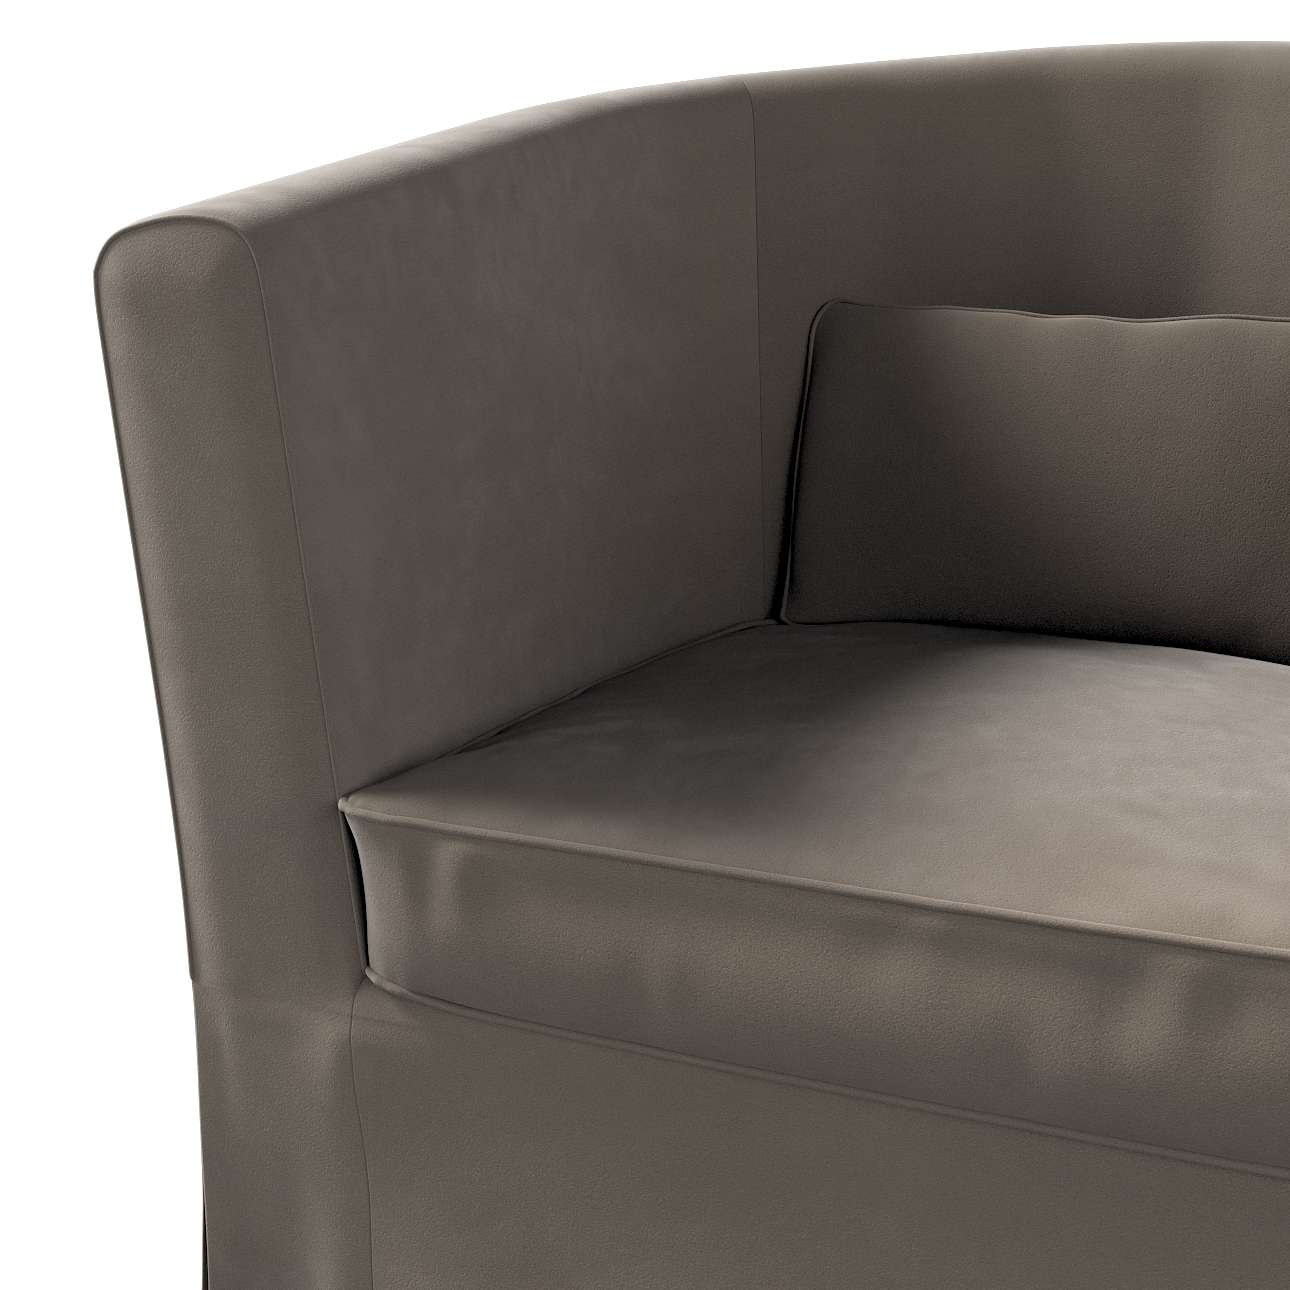 Pokrowiec na fotel Ektorp Tullsta w kolekcji Velvet, tkanina: 704-19